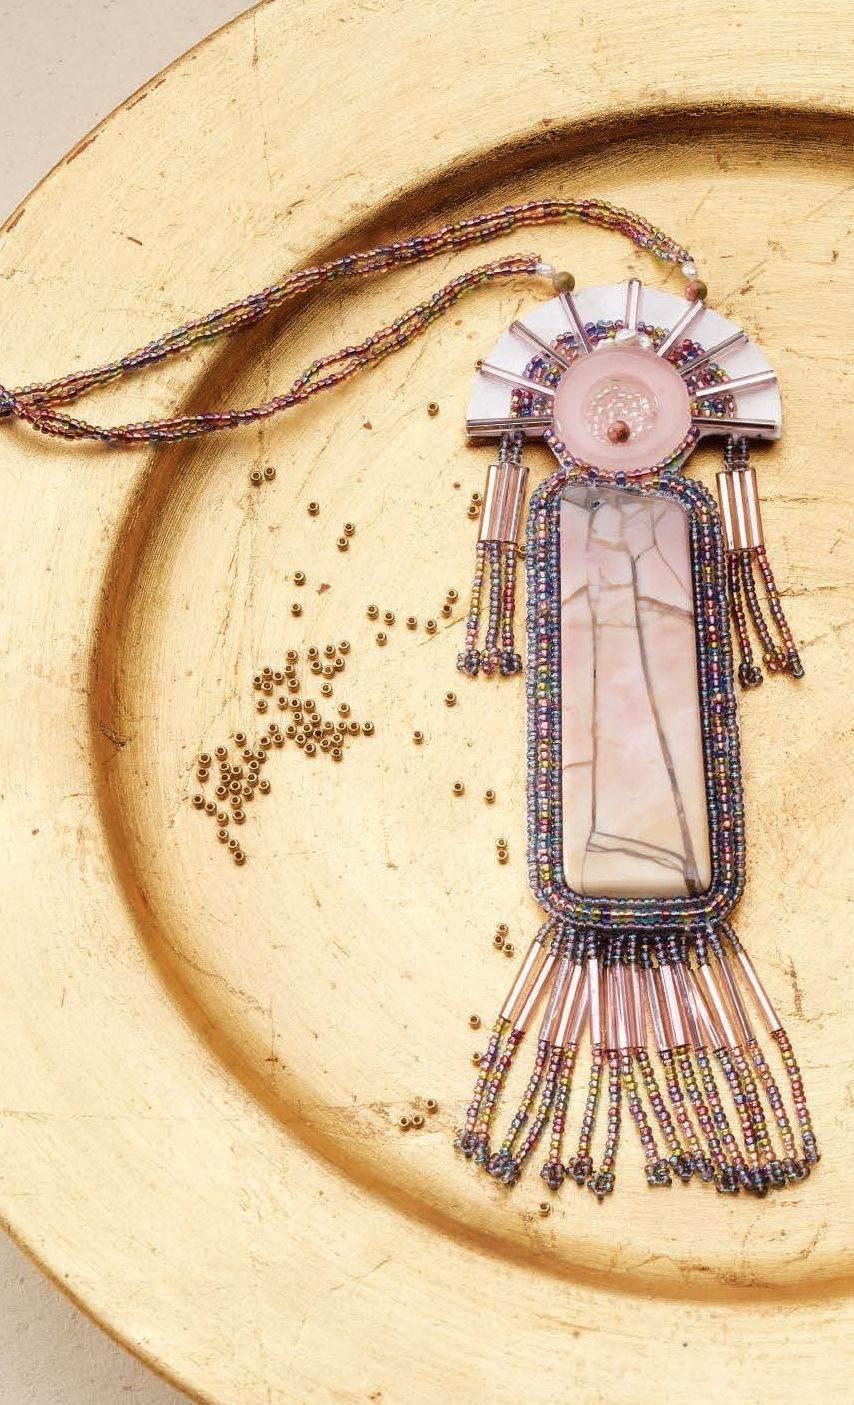 beadingdaily-bead-embroidery-patterns-tutorials-37647346863164272